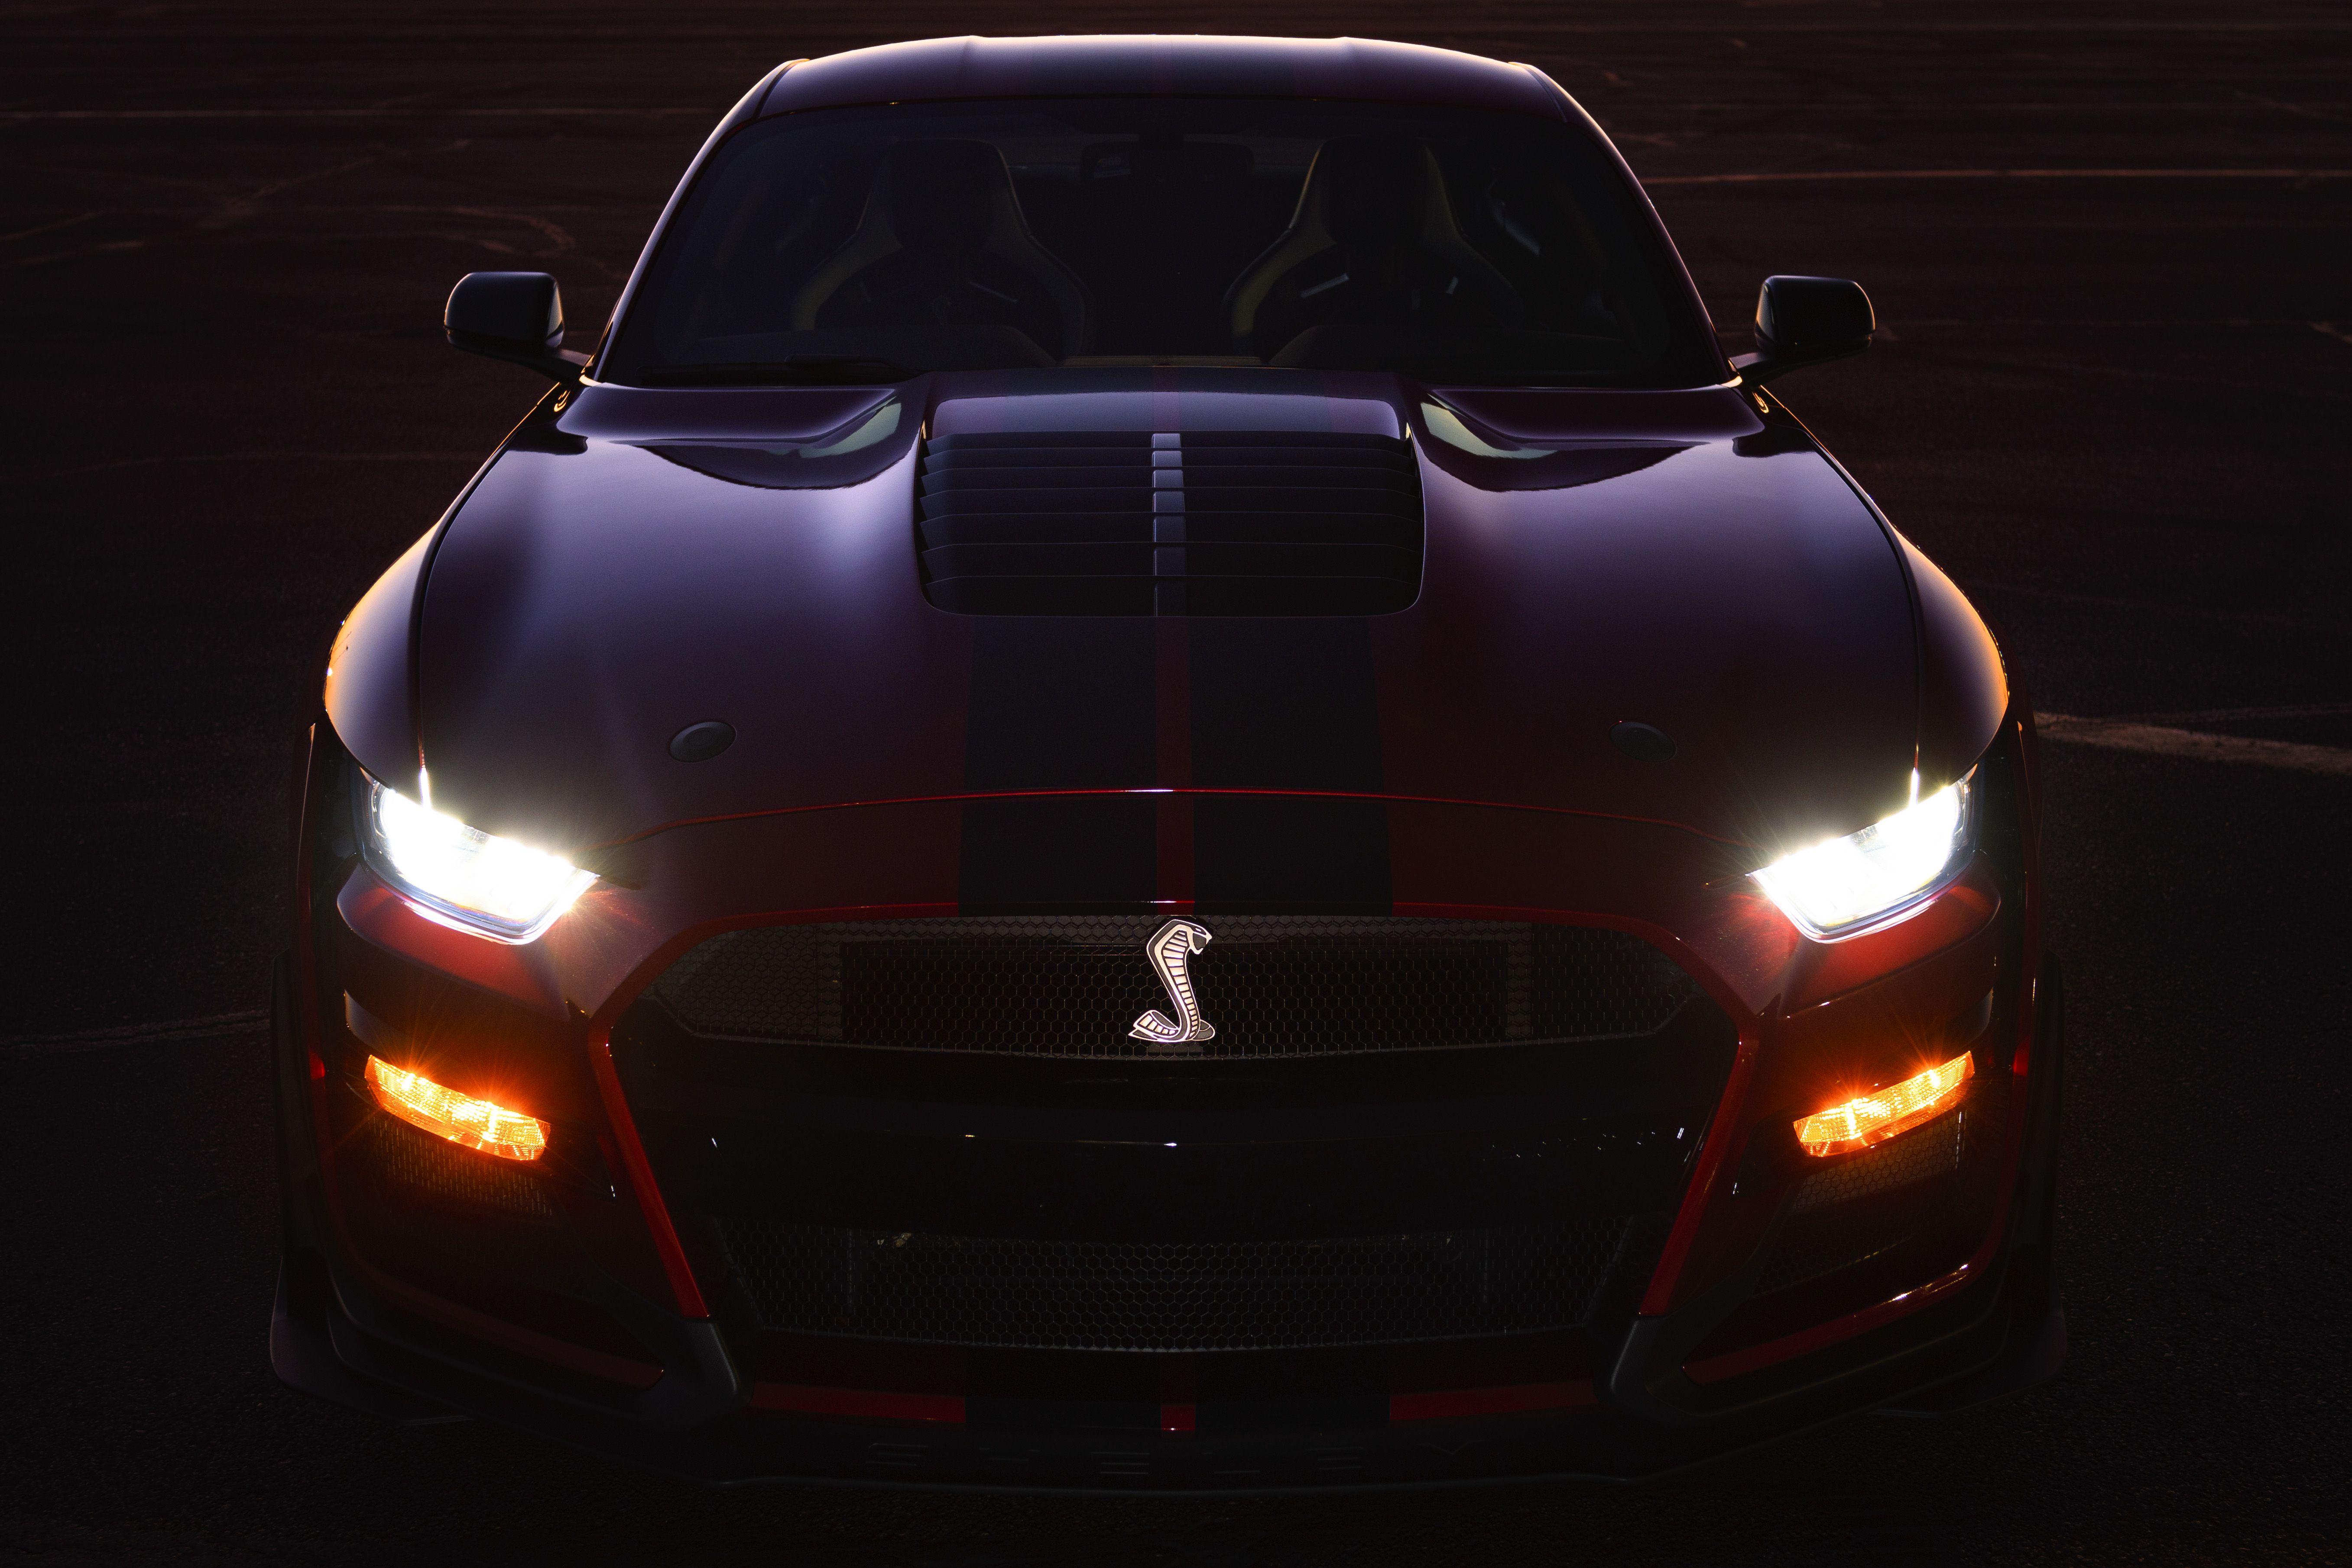 ford mustang shelby gt500 4k 1608819328 - Ford Mustang Shelby GT500 4k - Ford Mustang Shelby GT500 4k wallpapers